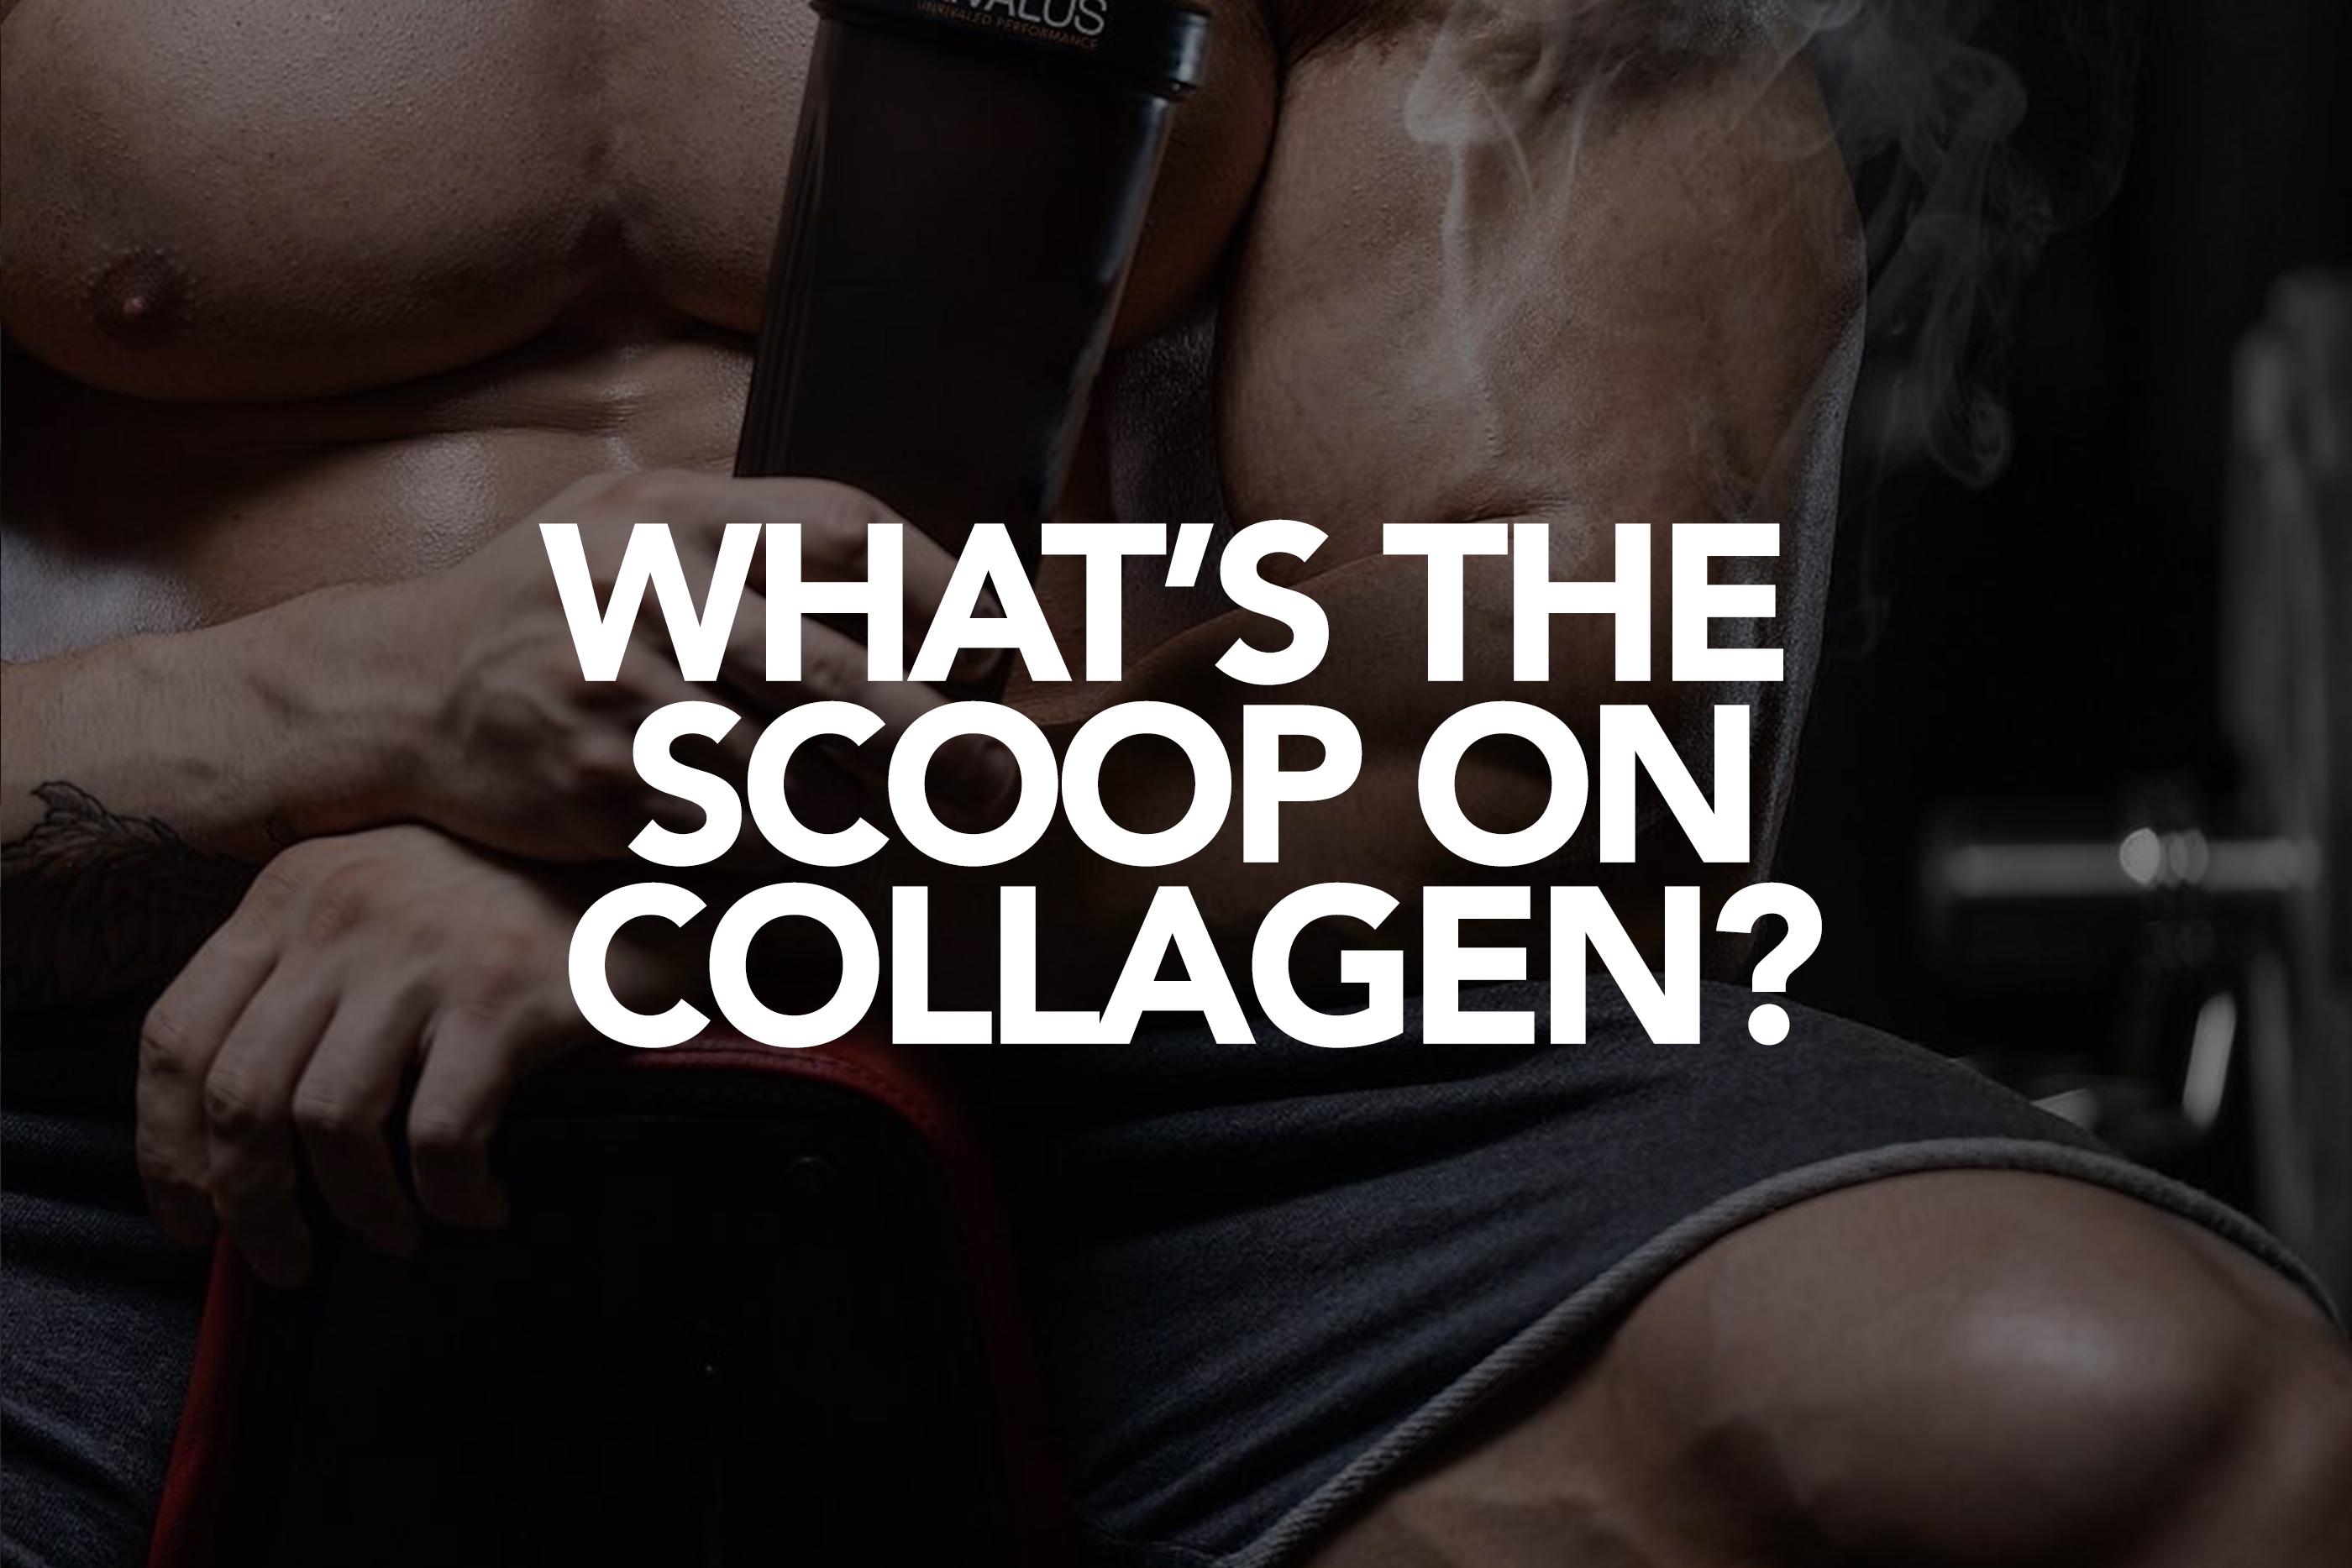 THE SCOOP ON COLLAGEN